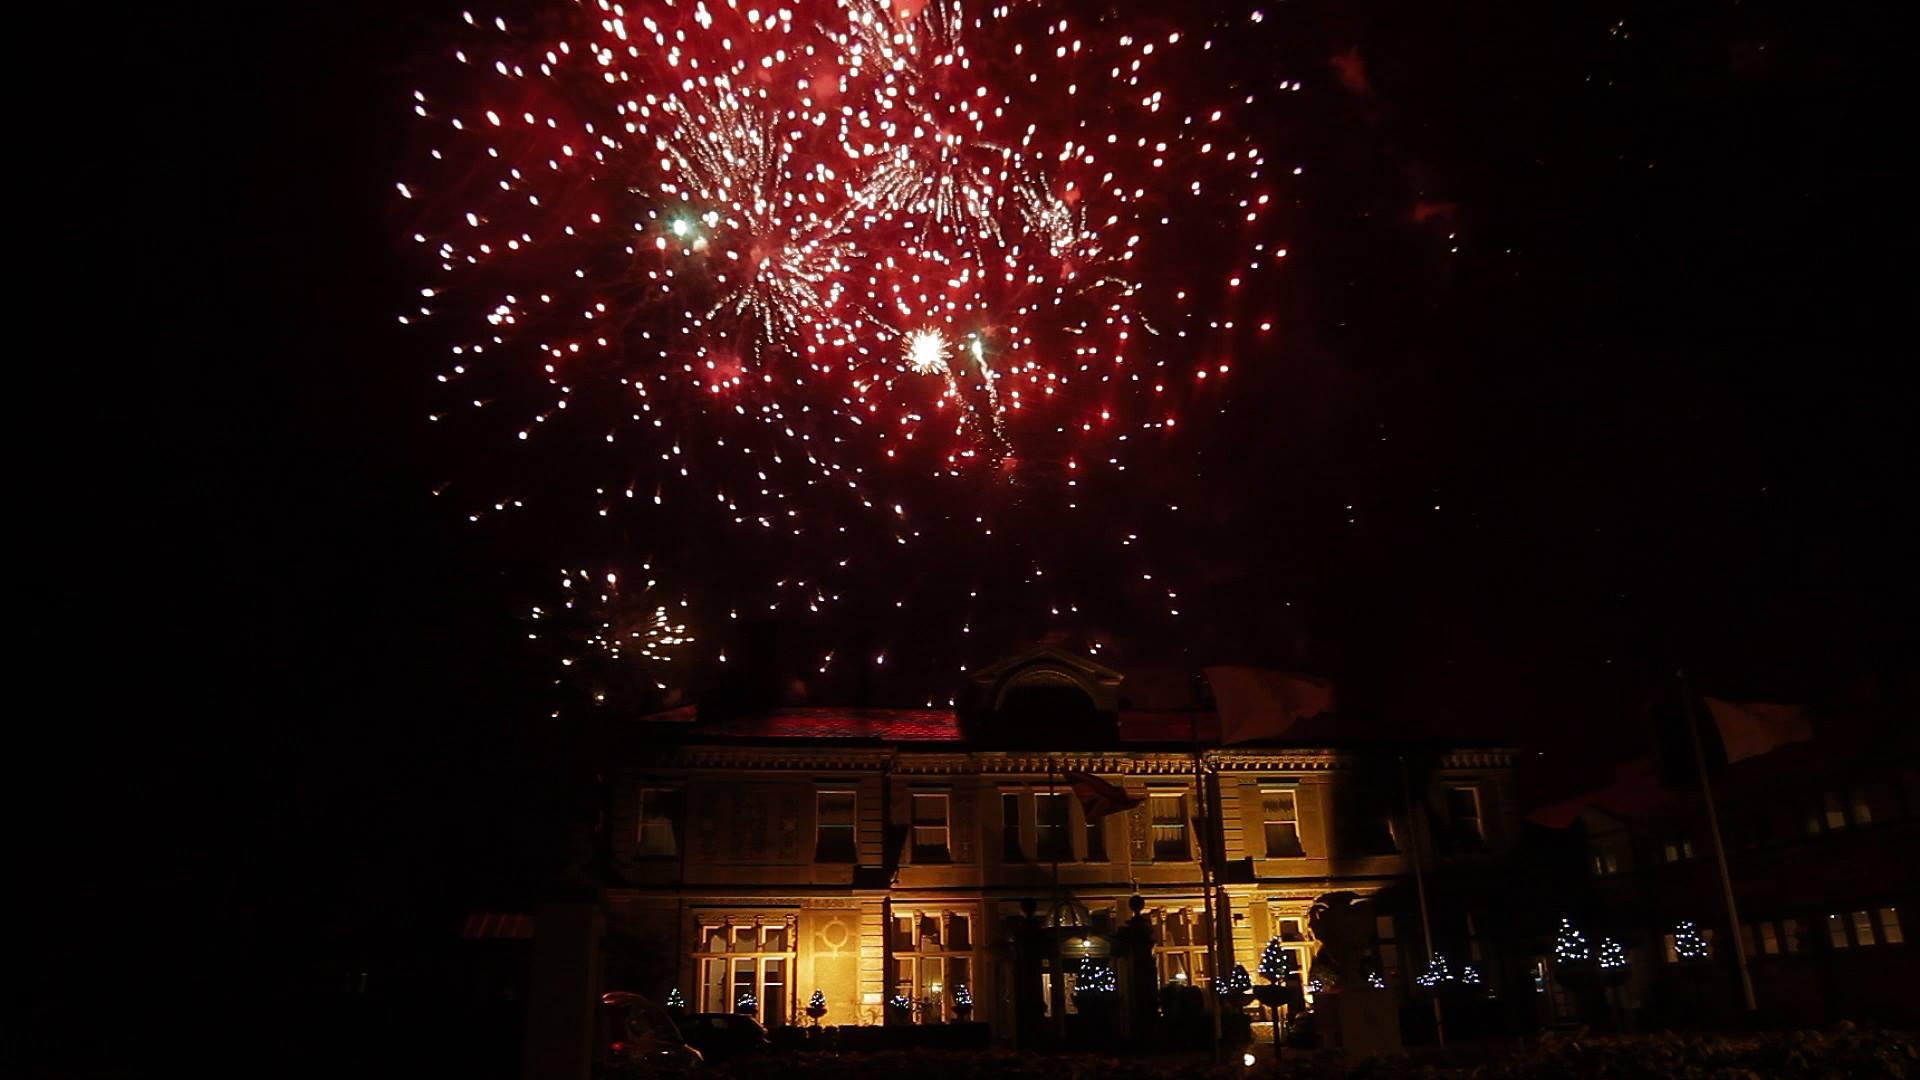 Fireworks over Downhal Hotel